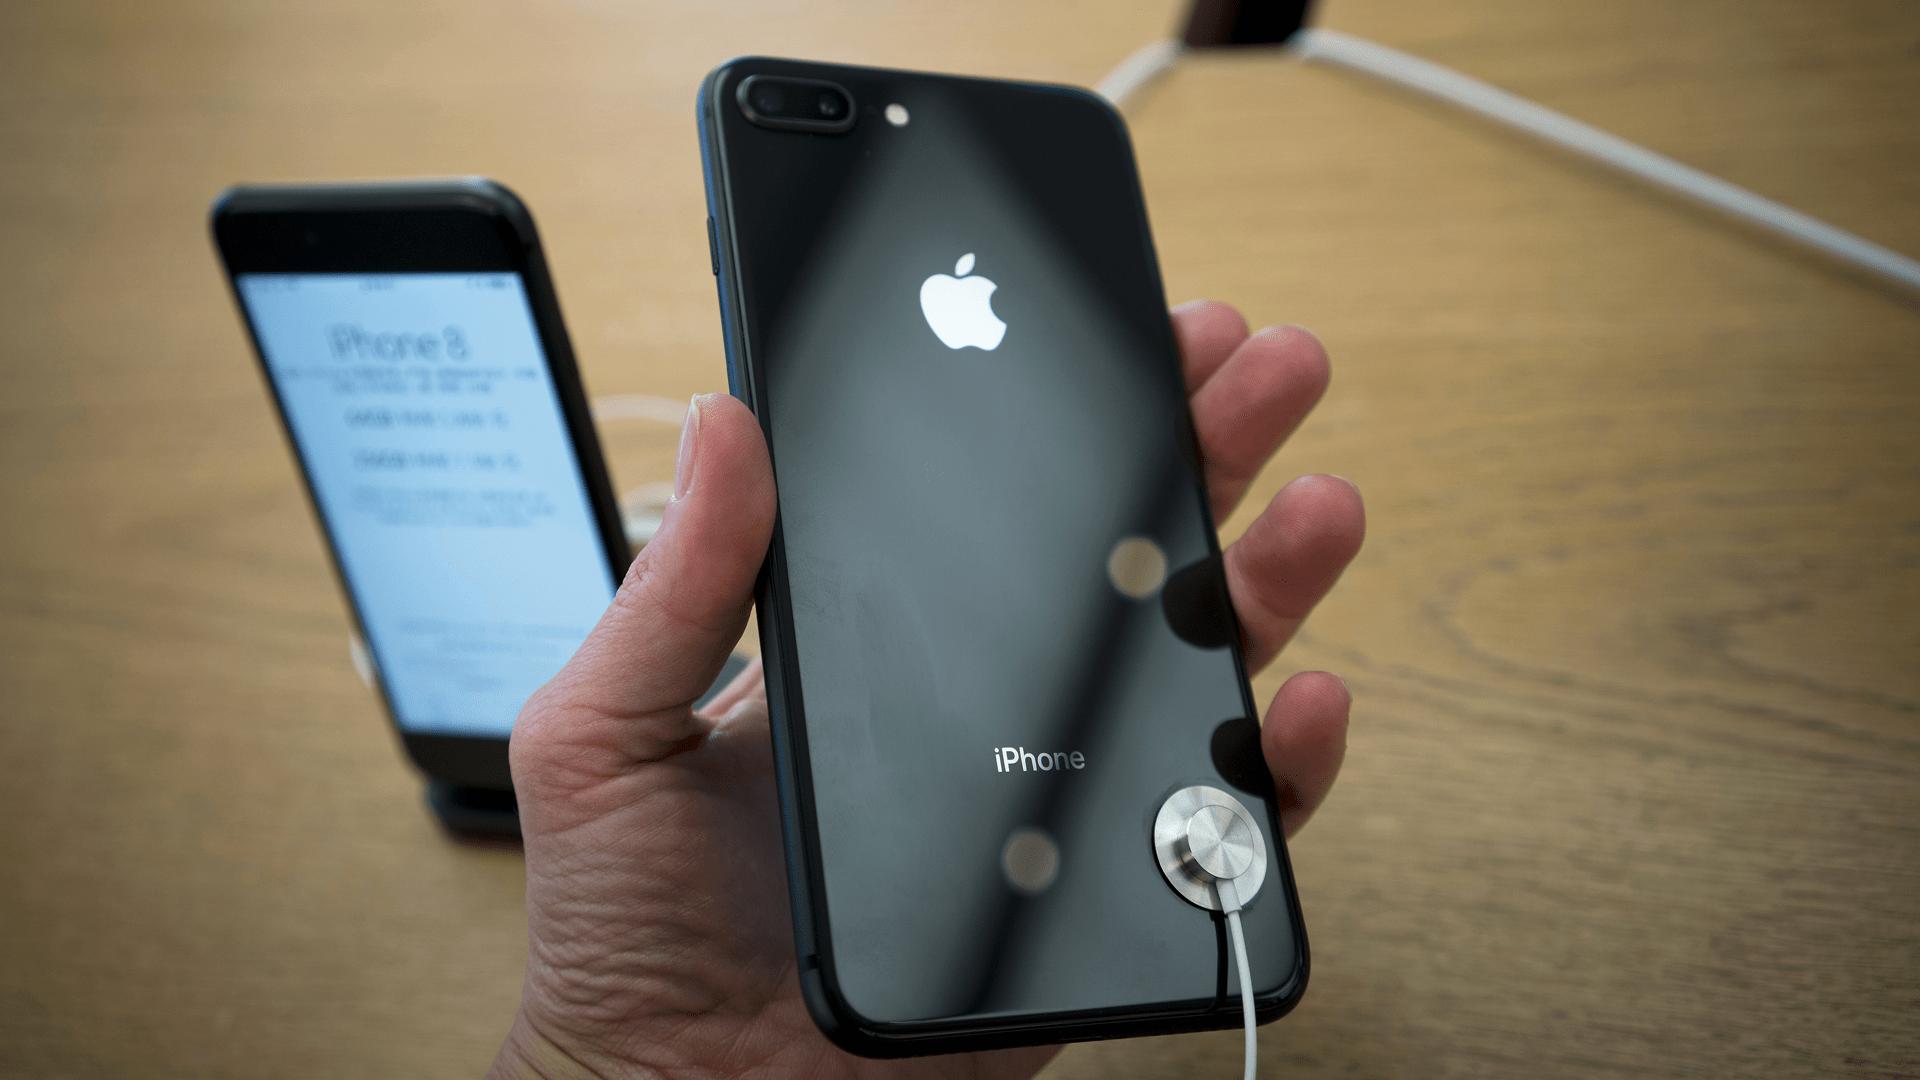 iPhone 8 close up 16x9